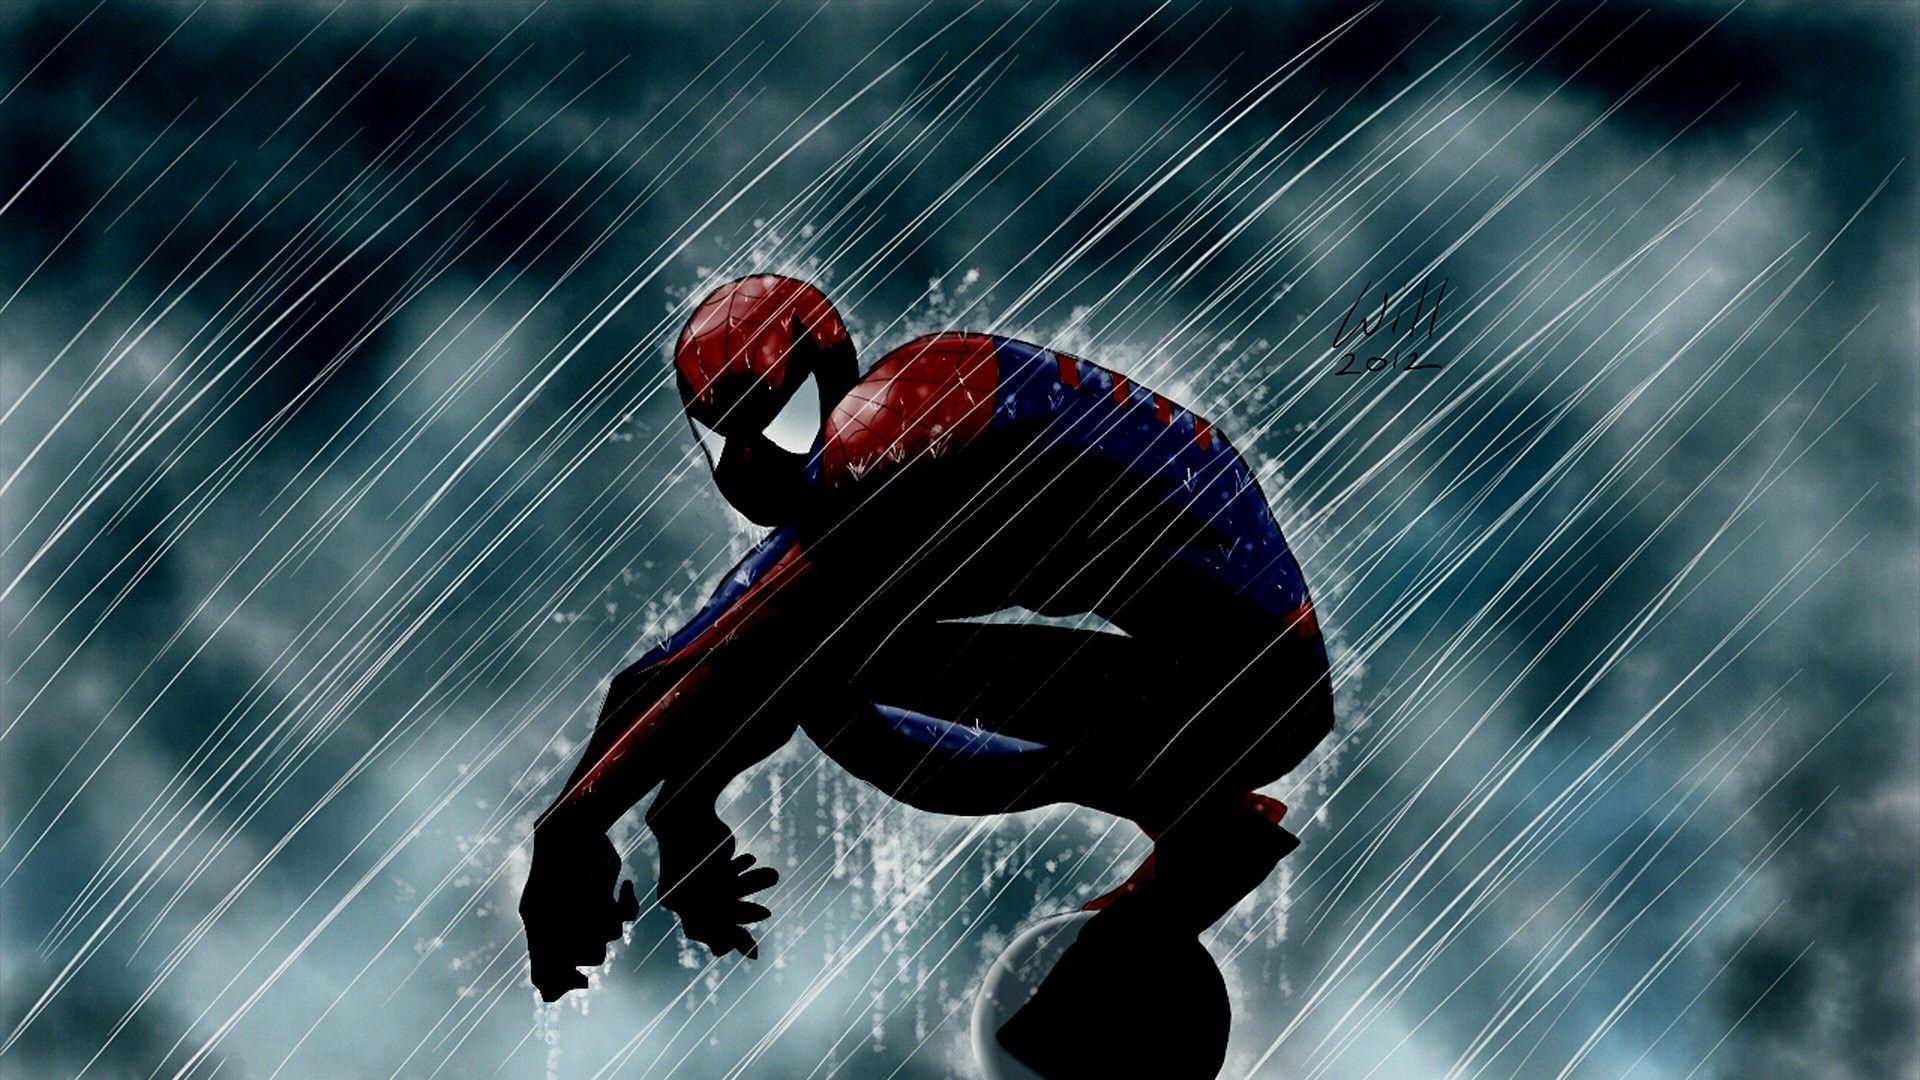 Hd wallpaper spiderman - Download Spiderman In Comic Hd Wallpapers 6286 Full Size